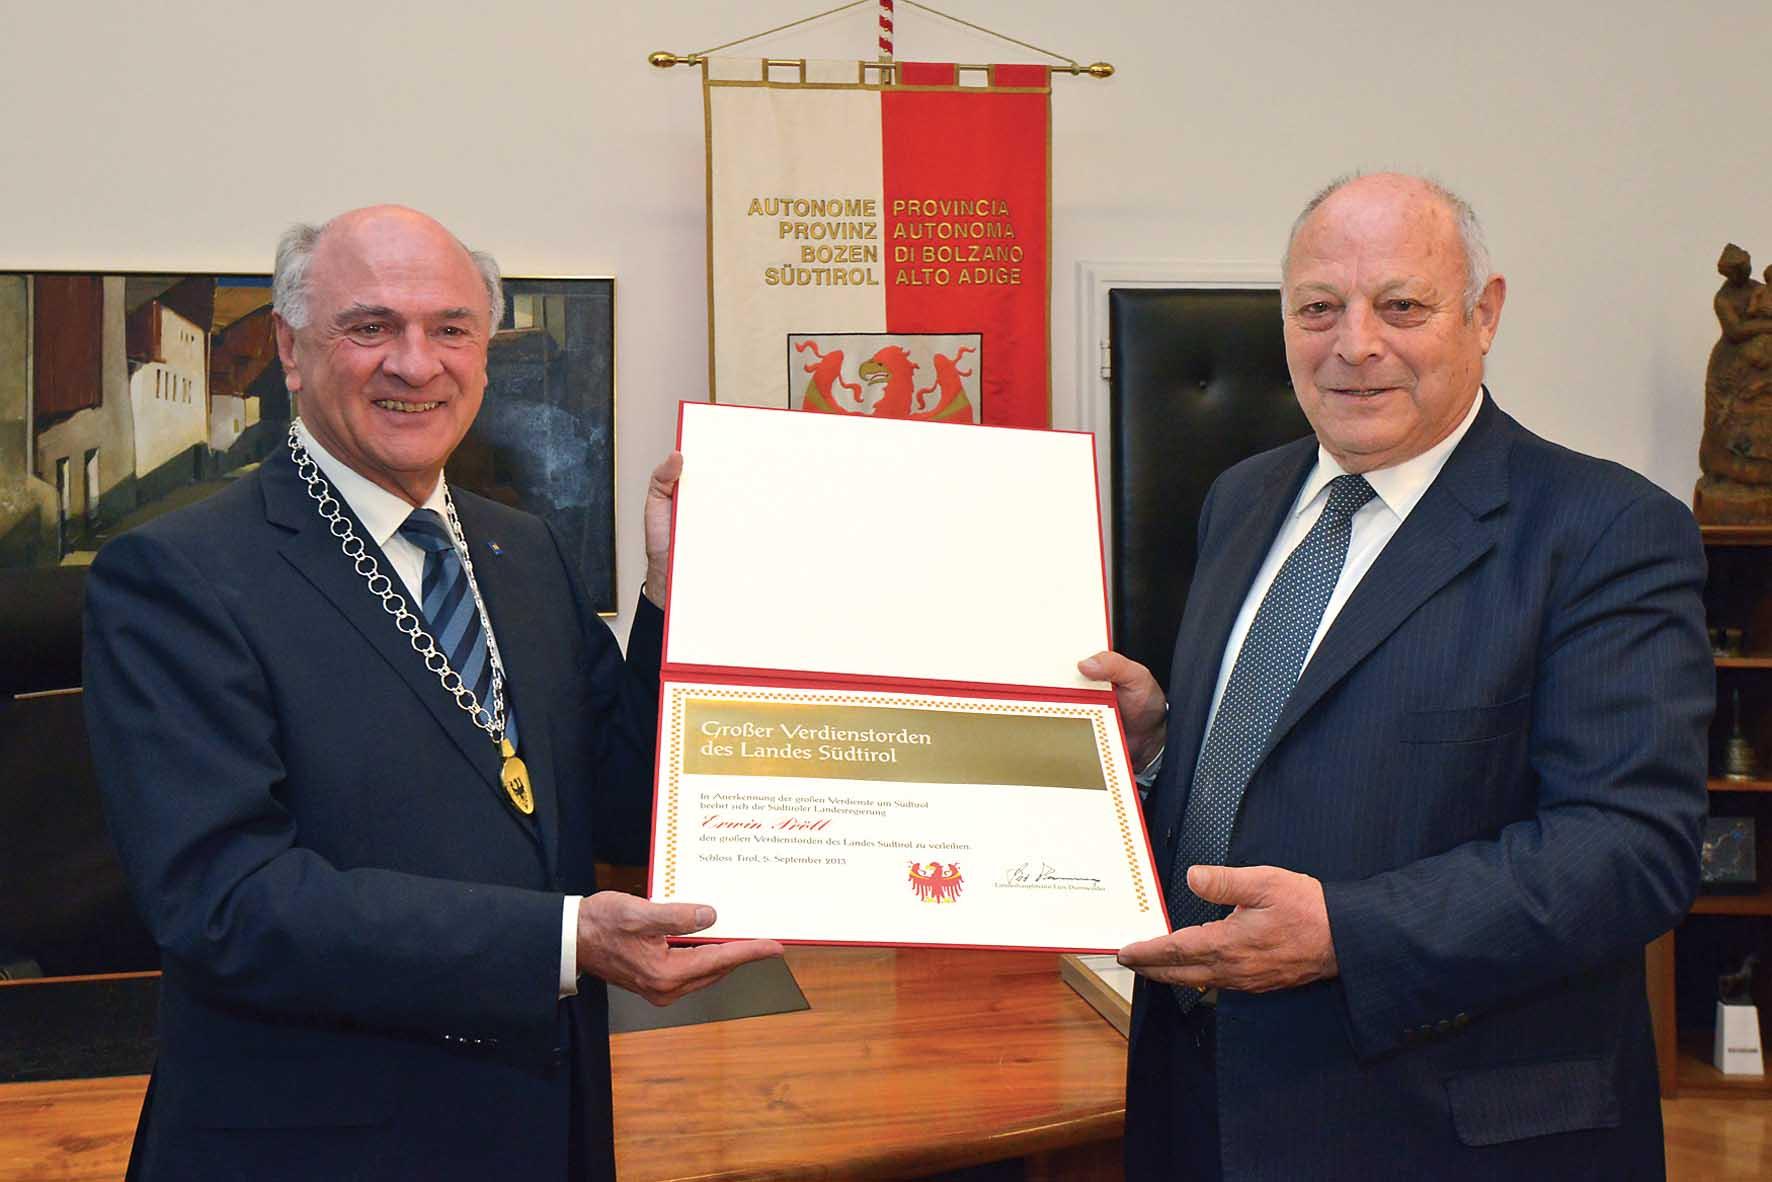 PAB Durnwalder governatore dell Austria20inferiore20Erwin20PrF6ll202 1